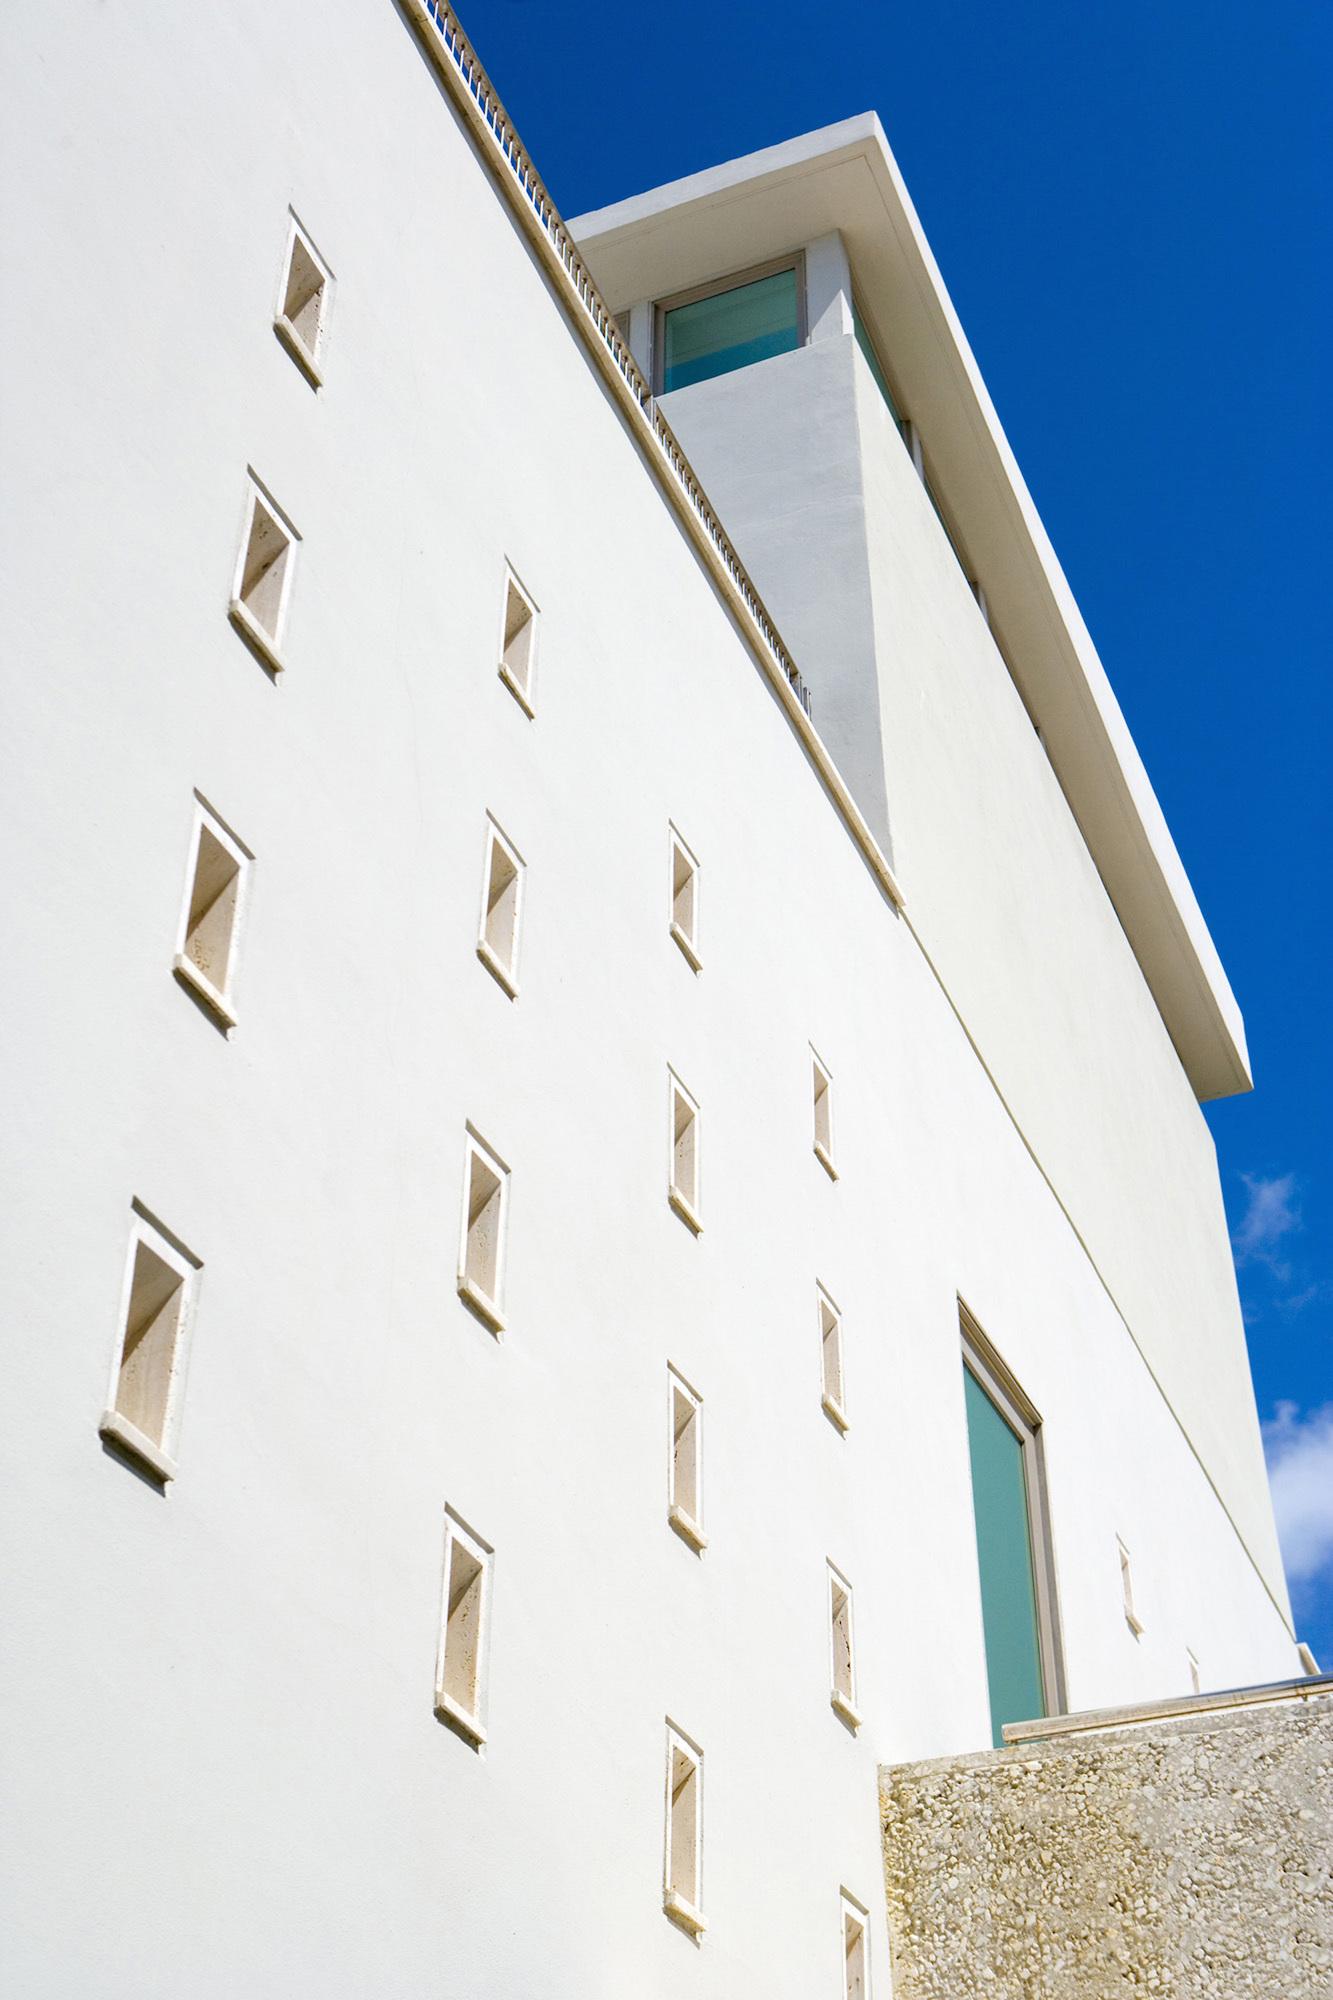 residencia-tavernier-drive-luis-pons-design-lab_chayane_house_032607_019